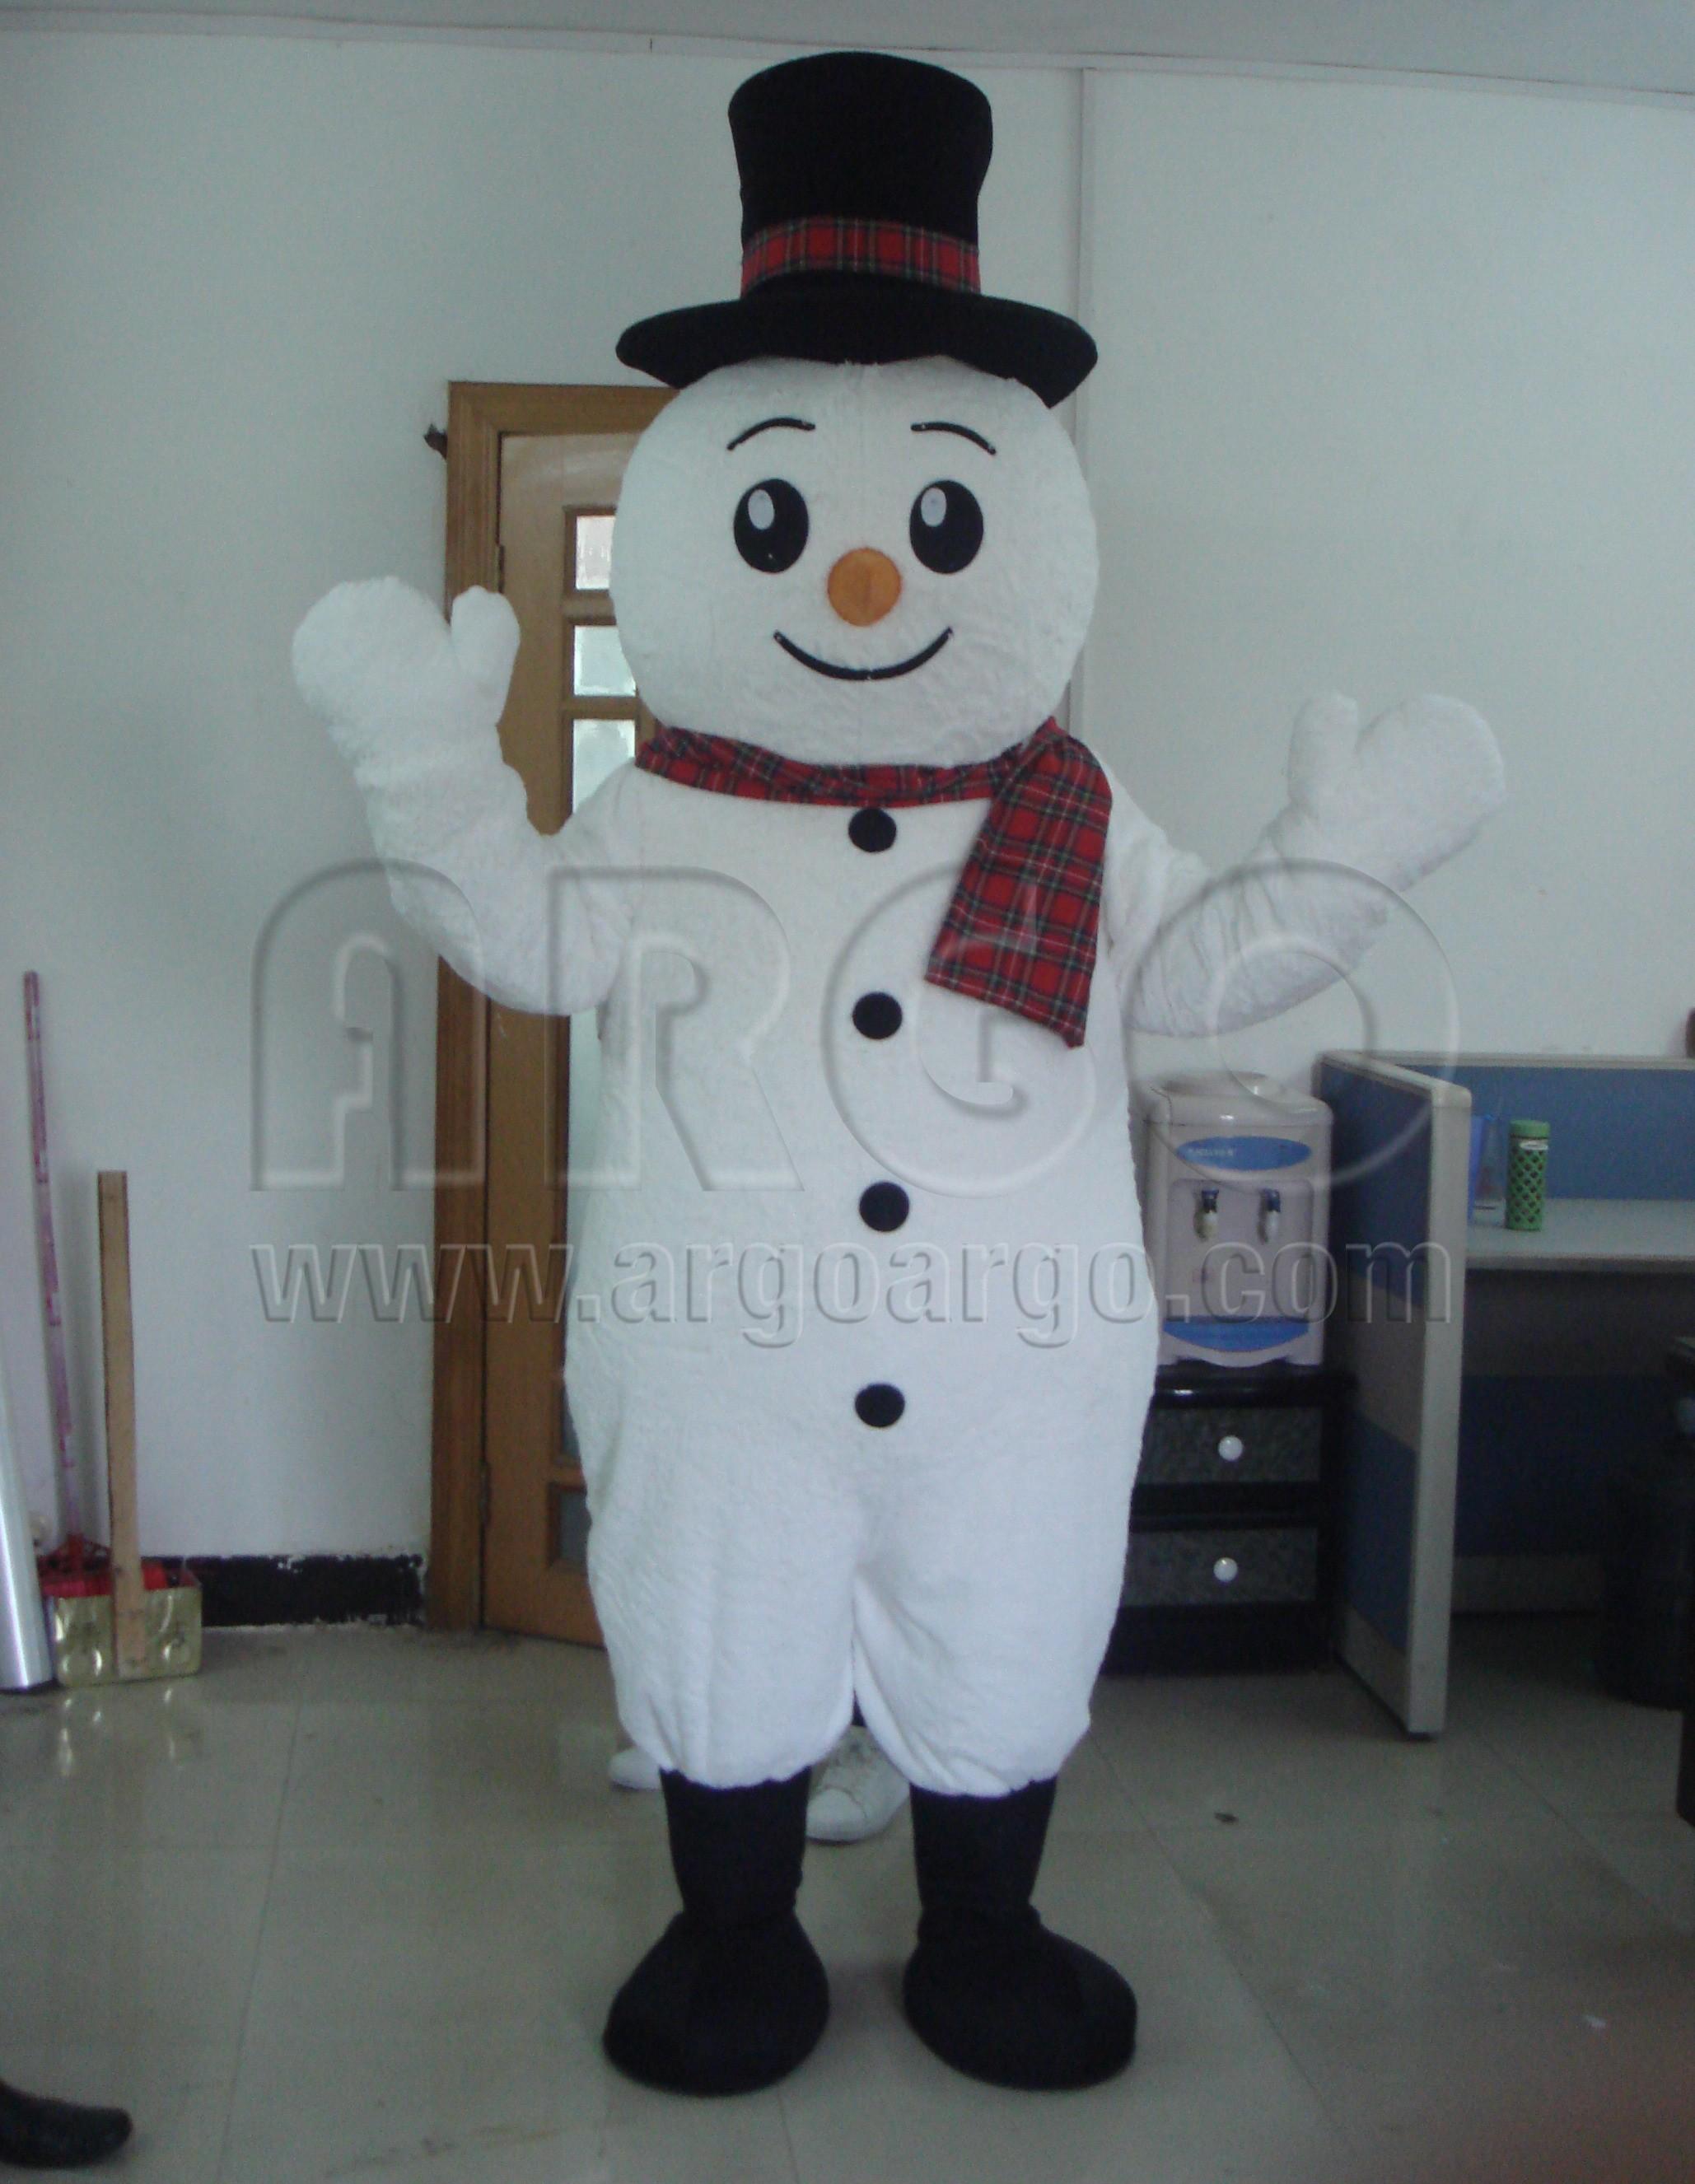 Snow Man Mascot